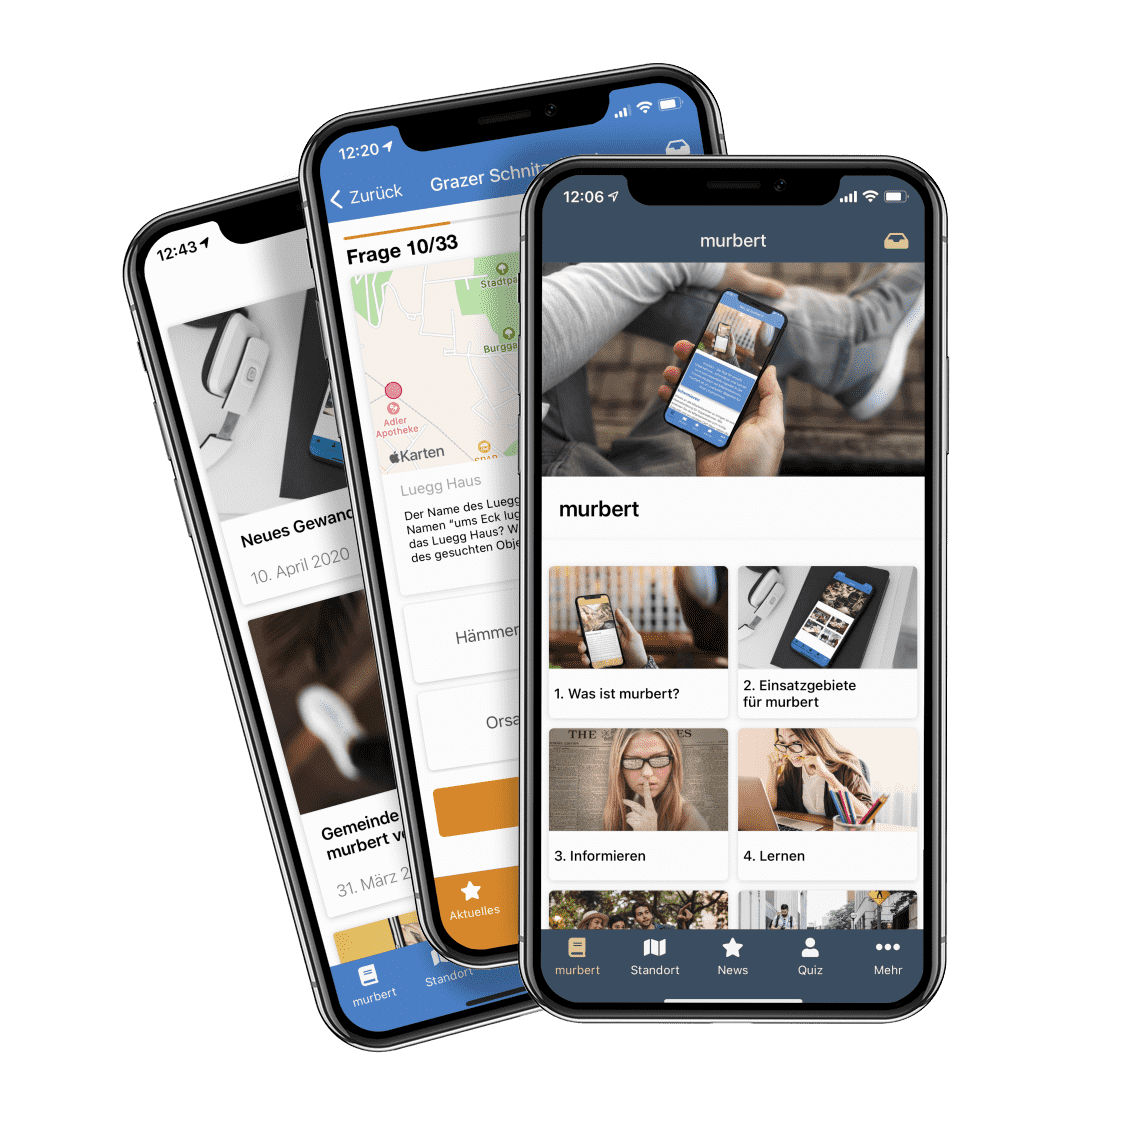 murbert - der App-Baukasten für smarte Apps